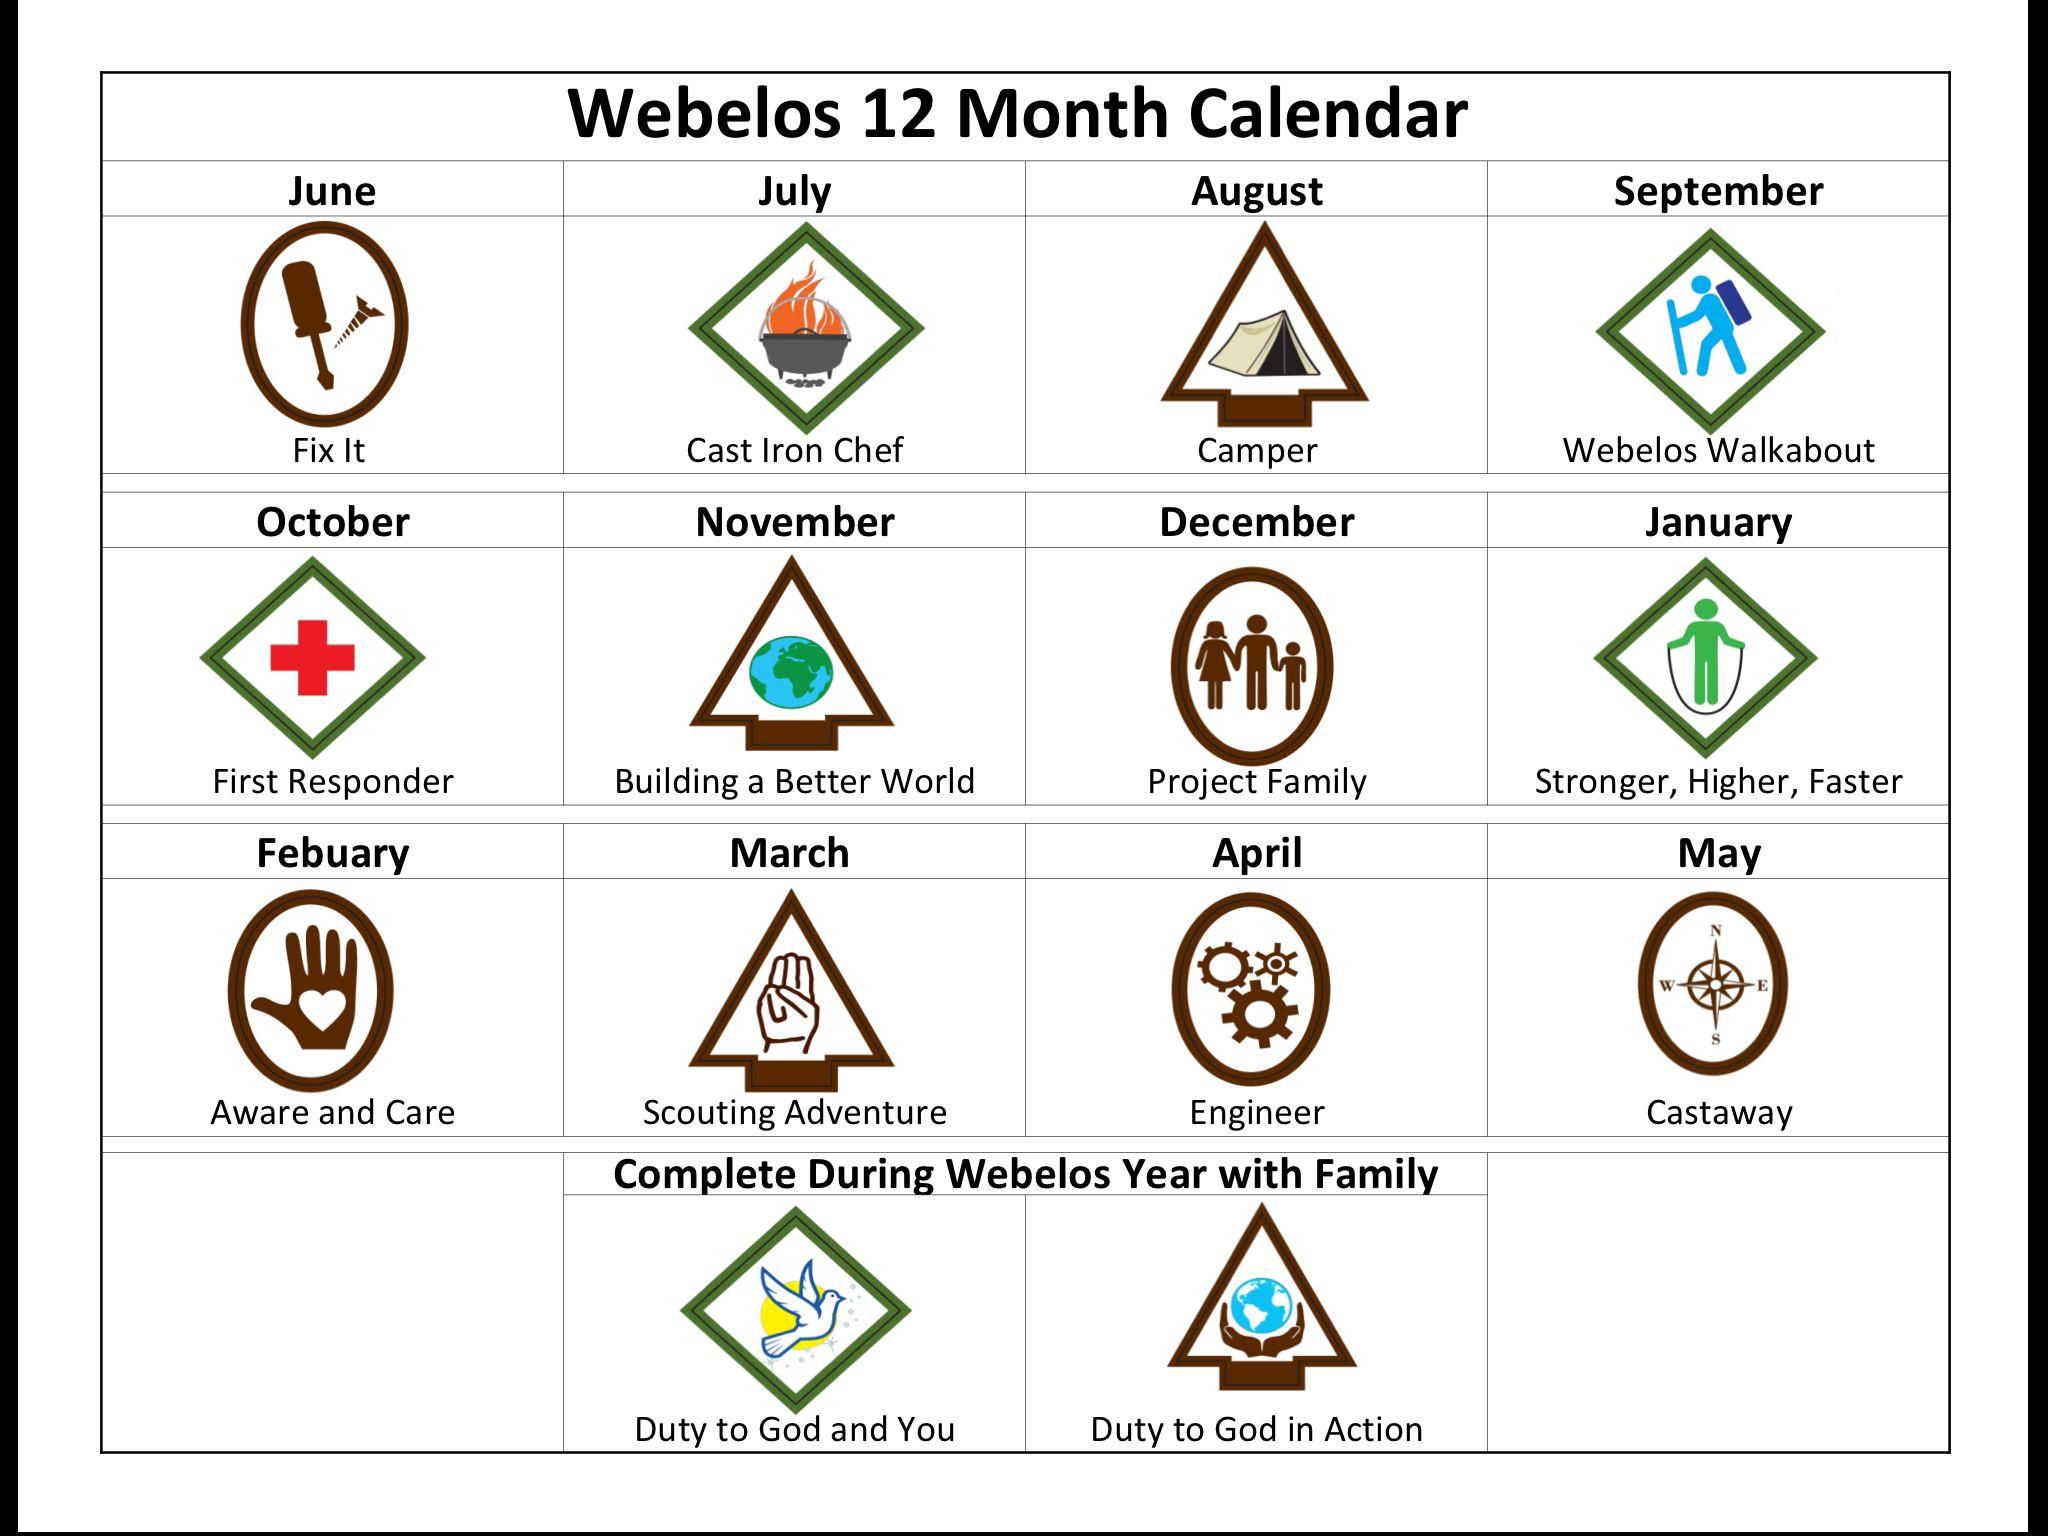 worksheet Webelos Citizen Worksheet 78 best images about webelos on pinterest craftsman compliments of and campfire crafts